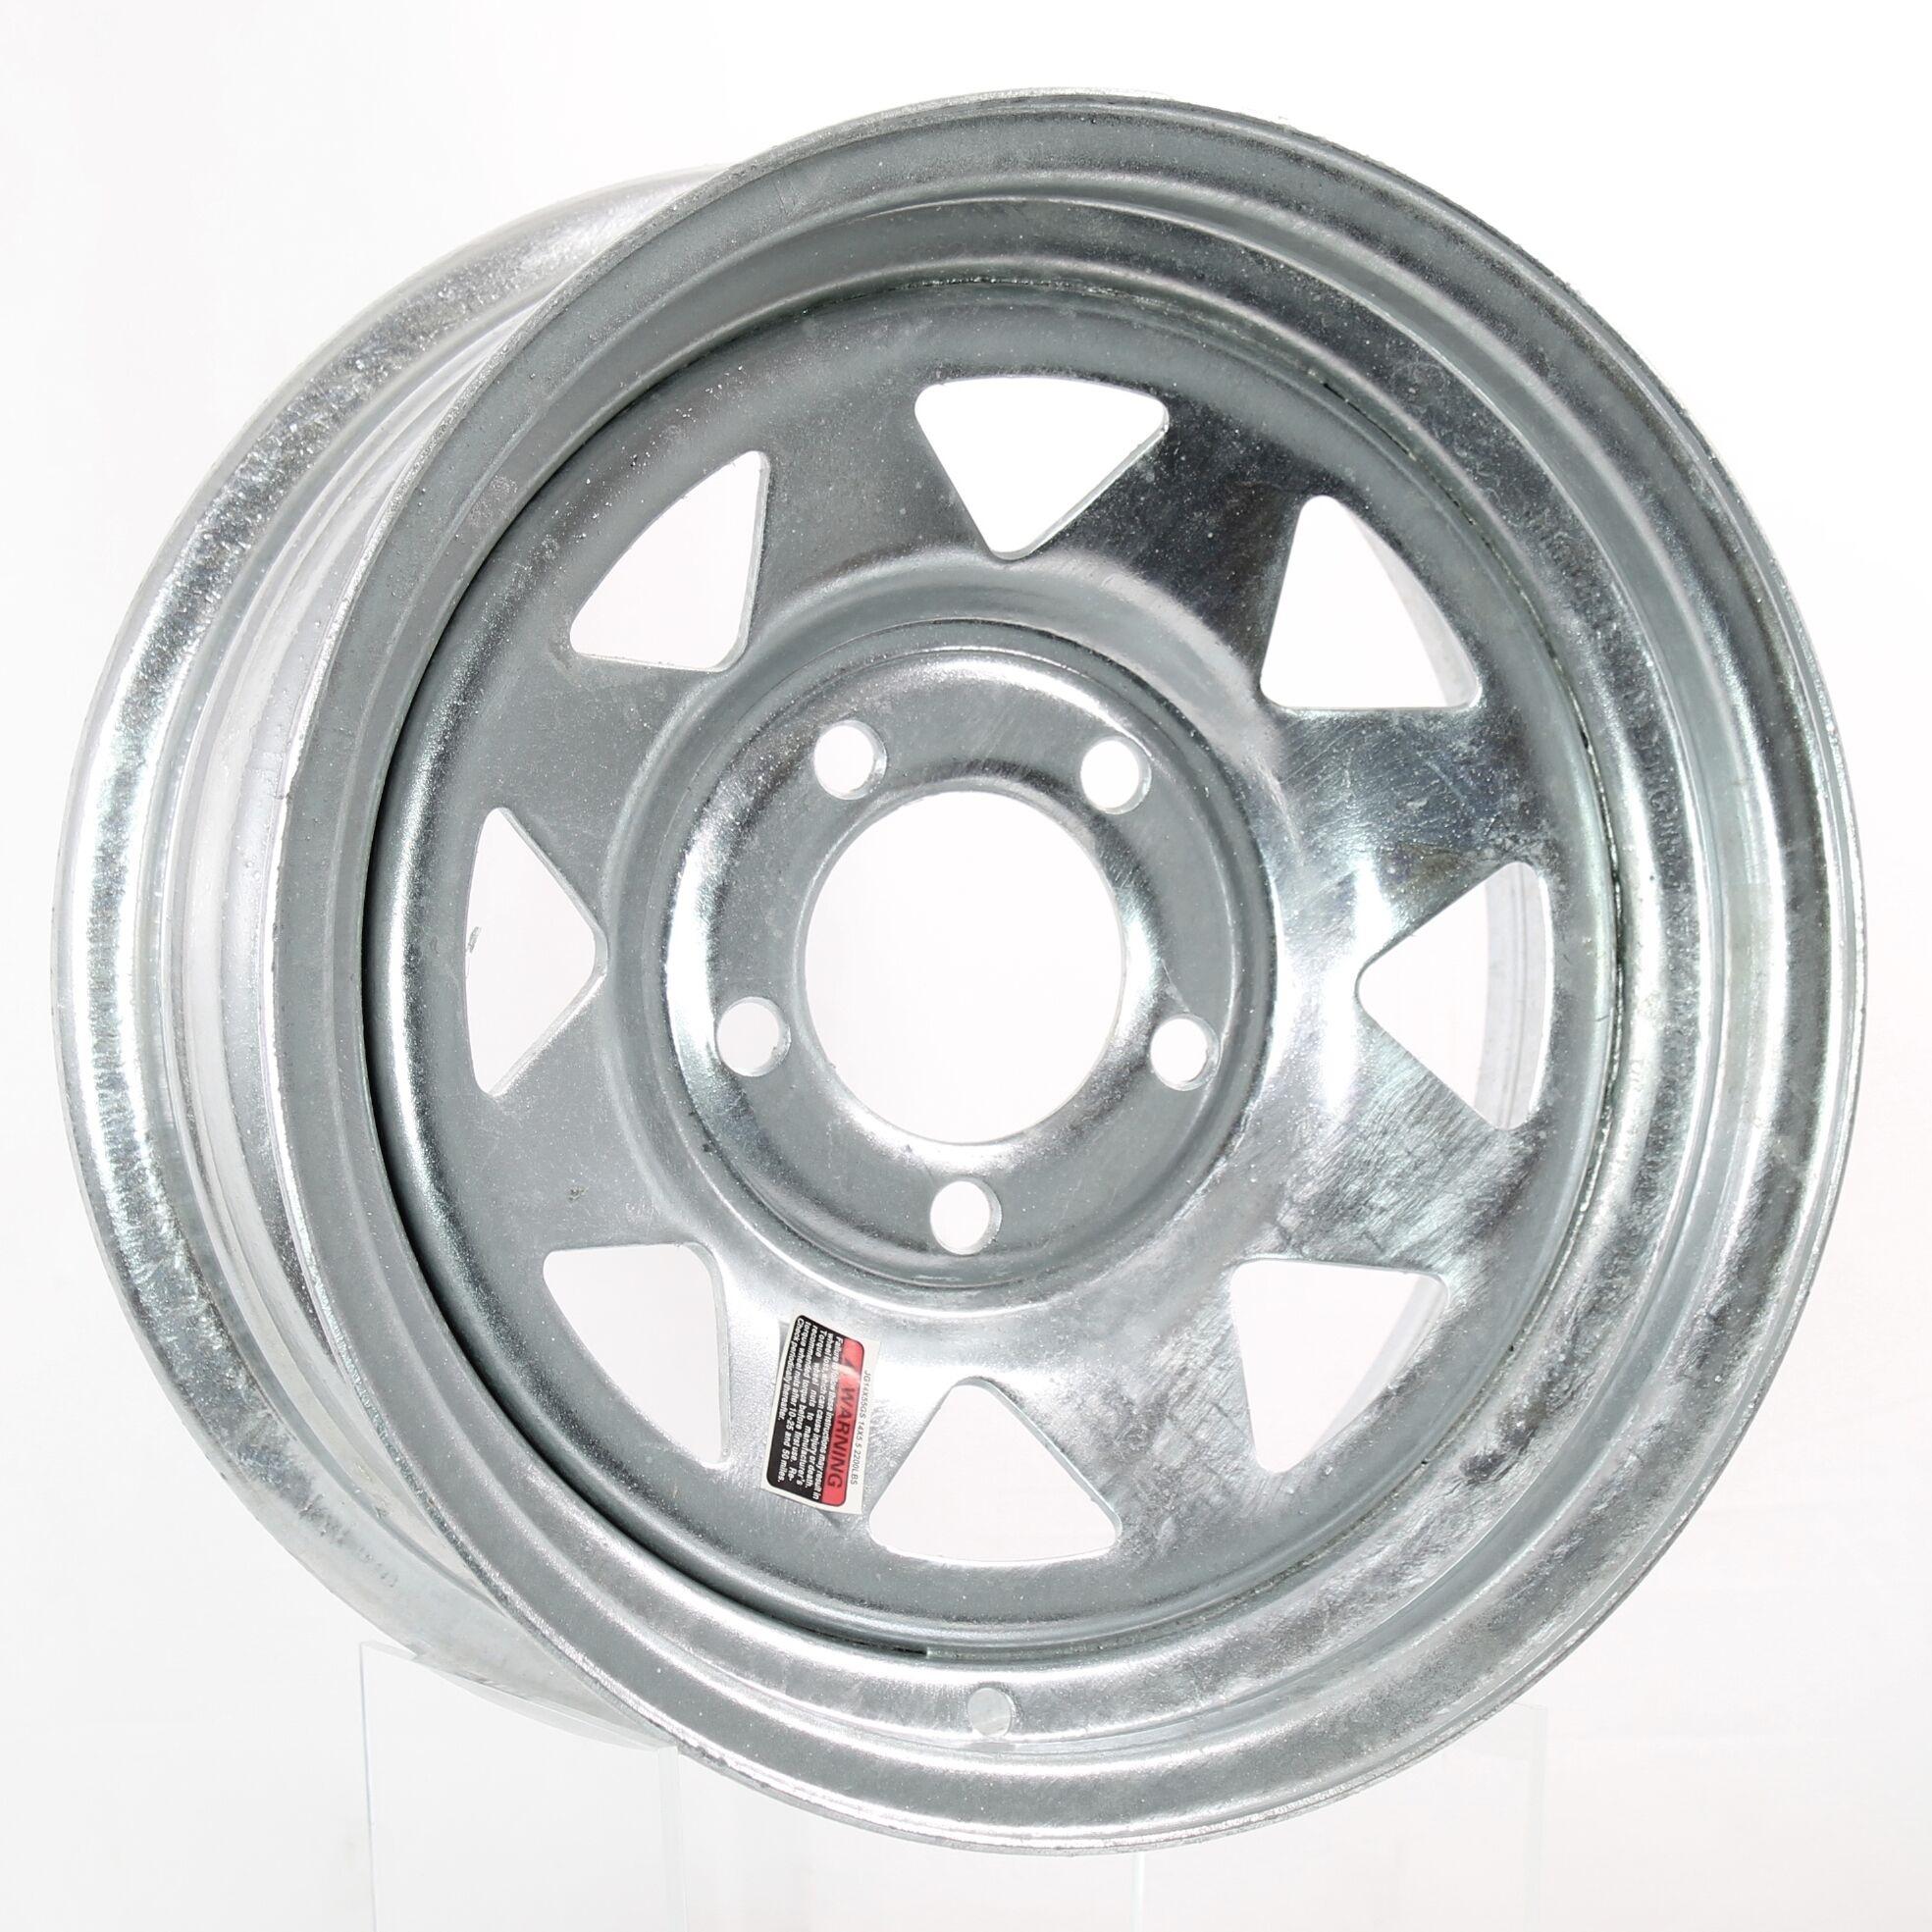 3.19 Center Bore 5 Lug Trailer Rim Wheel JG 13X4.5 Black Spoke 1730 Lb